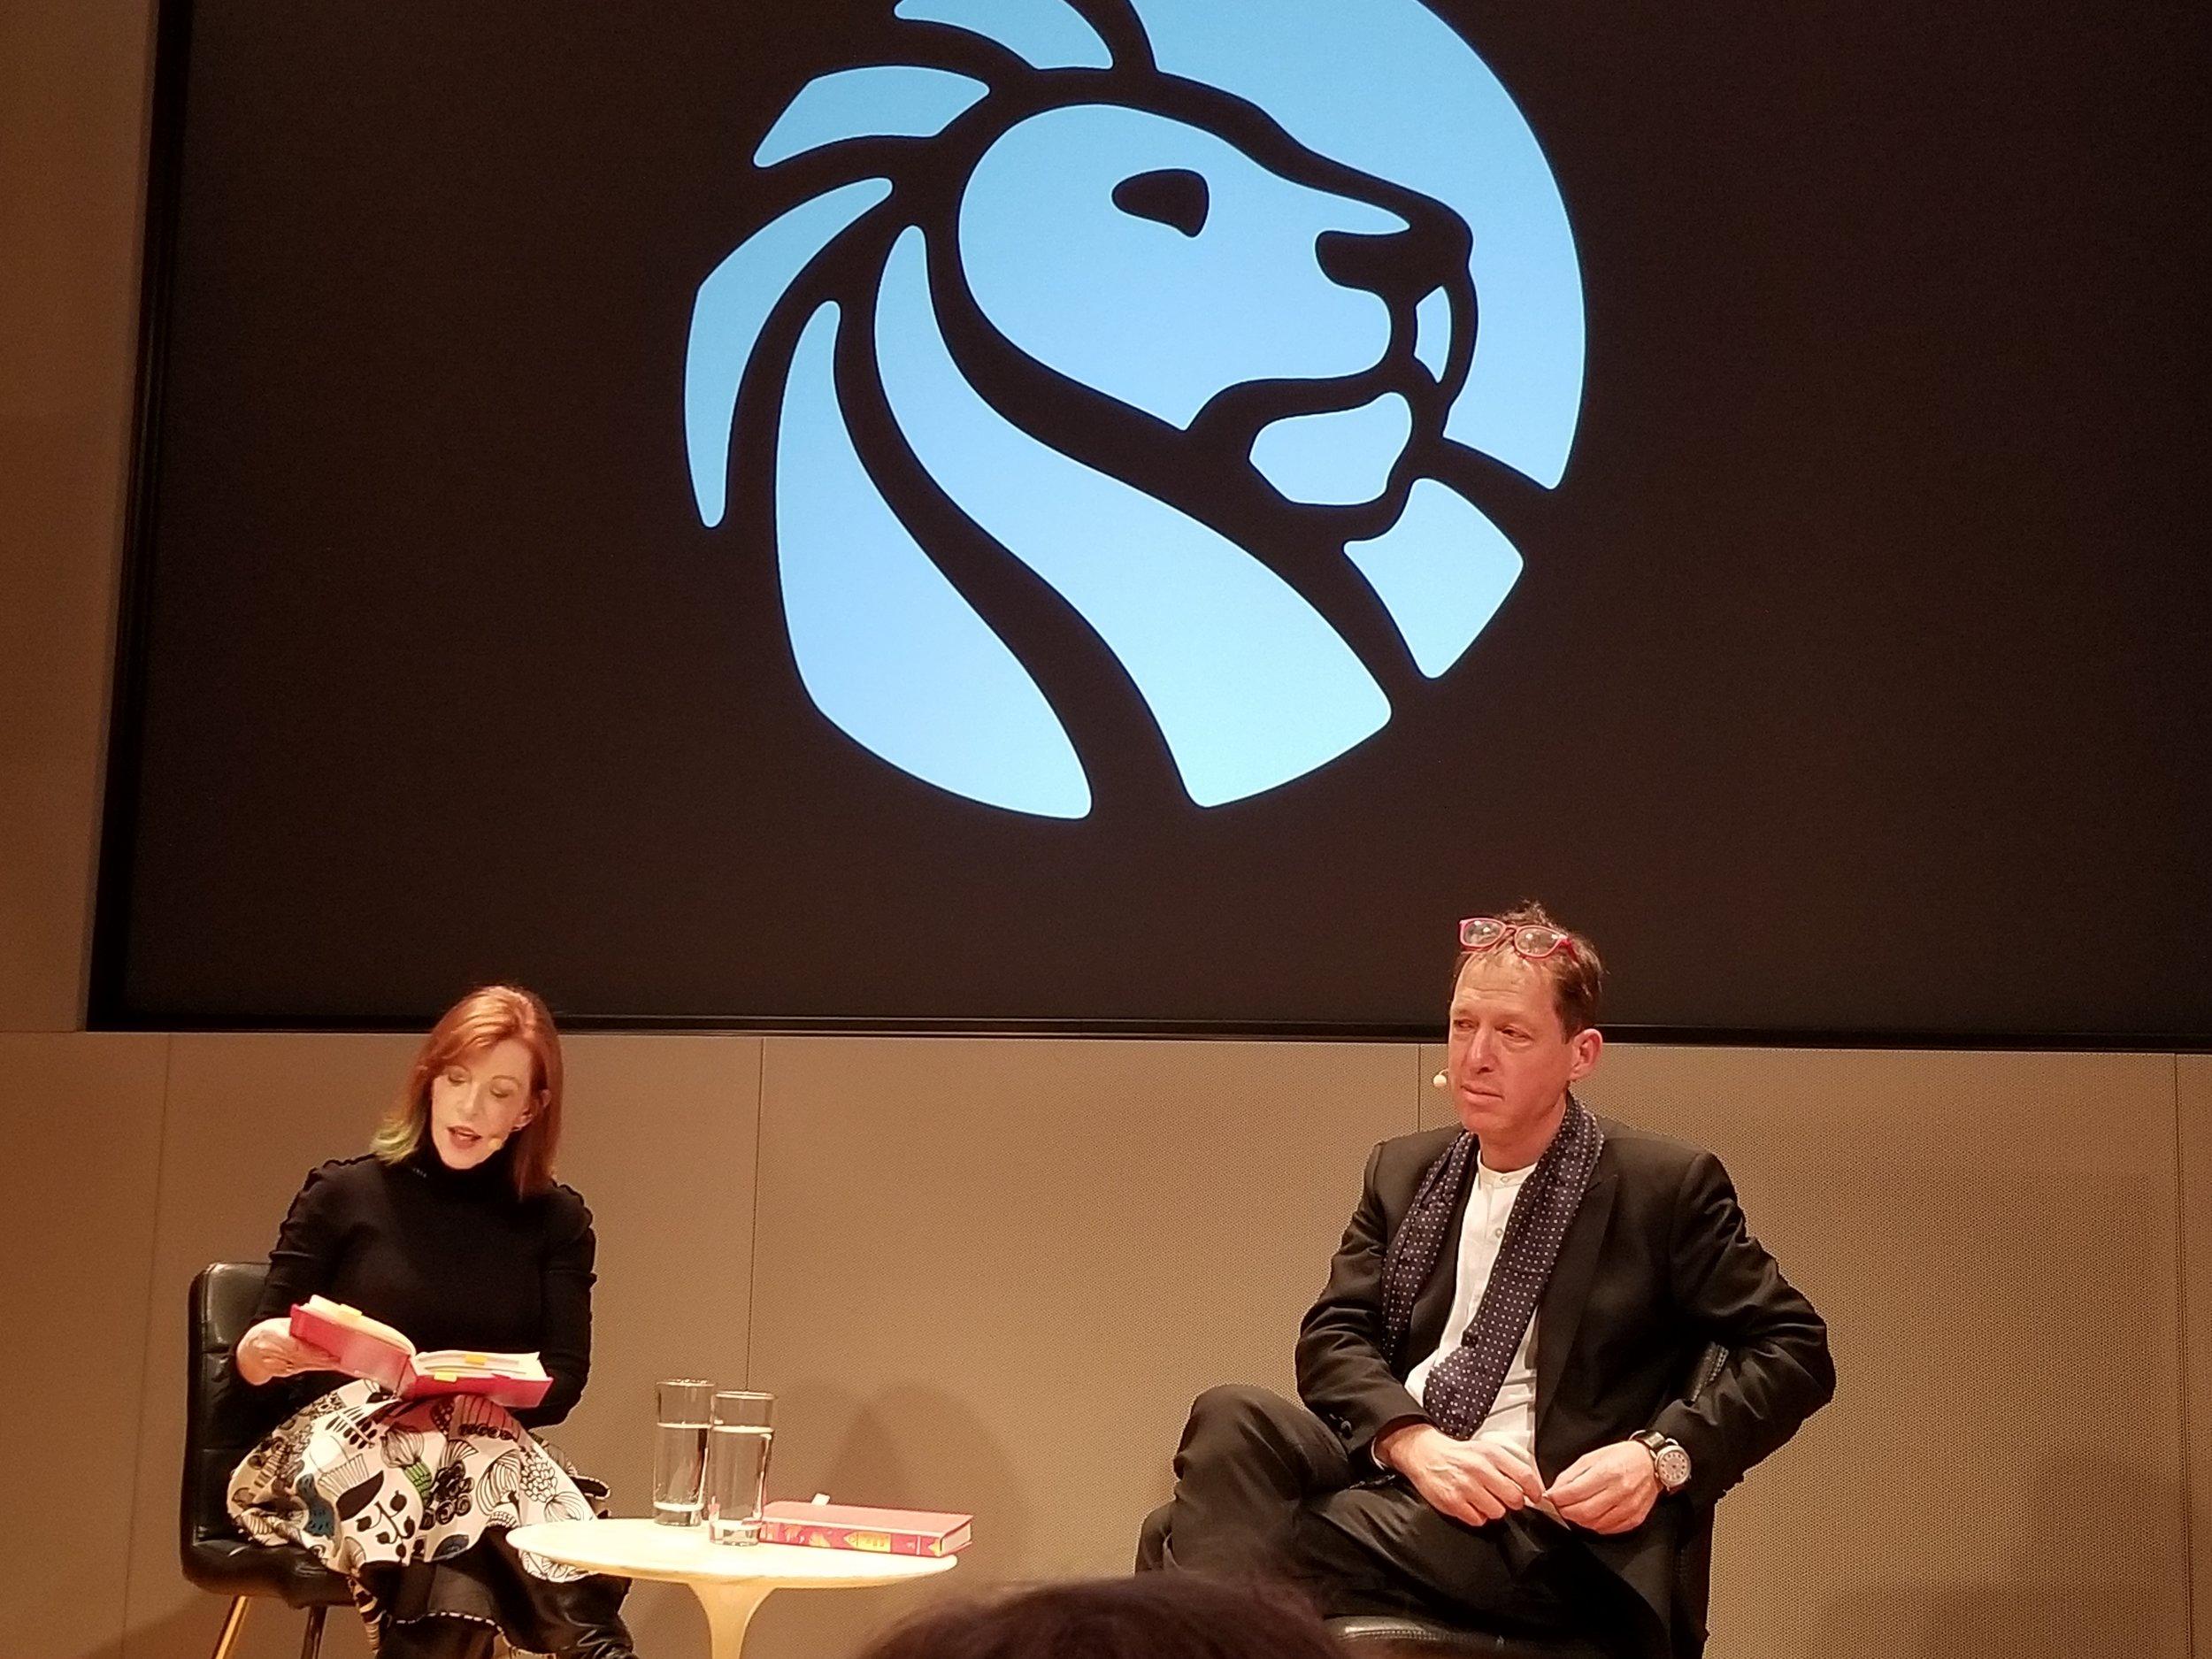 Susan Orlean and Paul Holdengraber